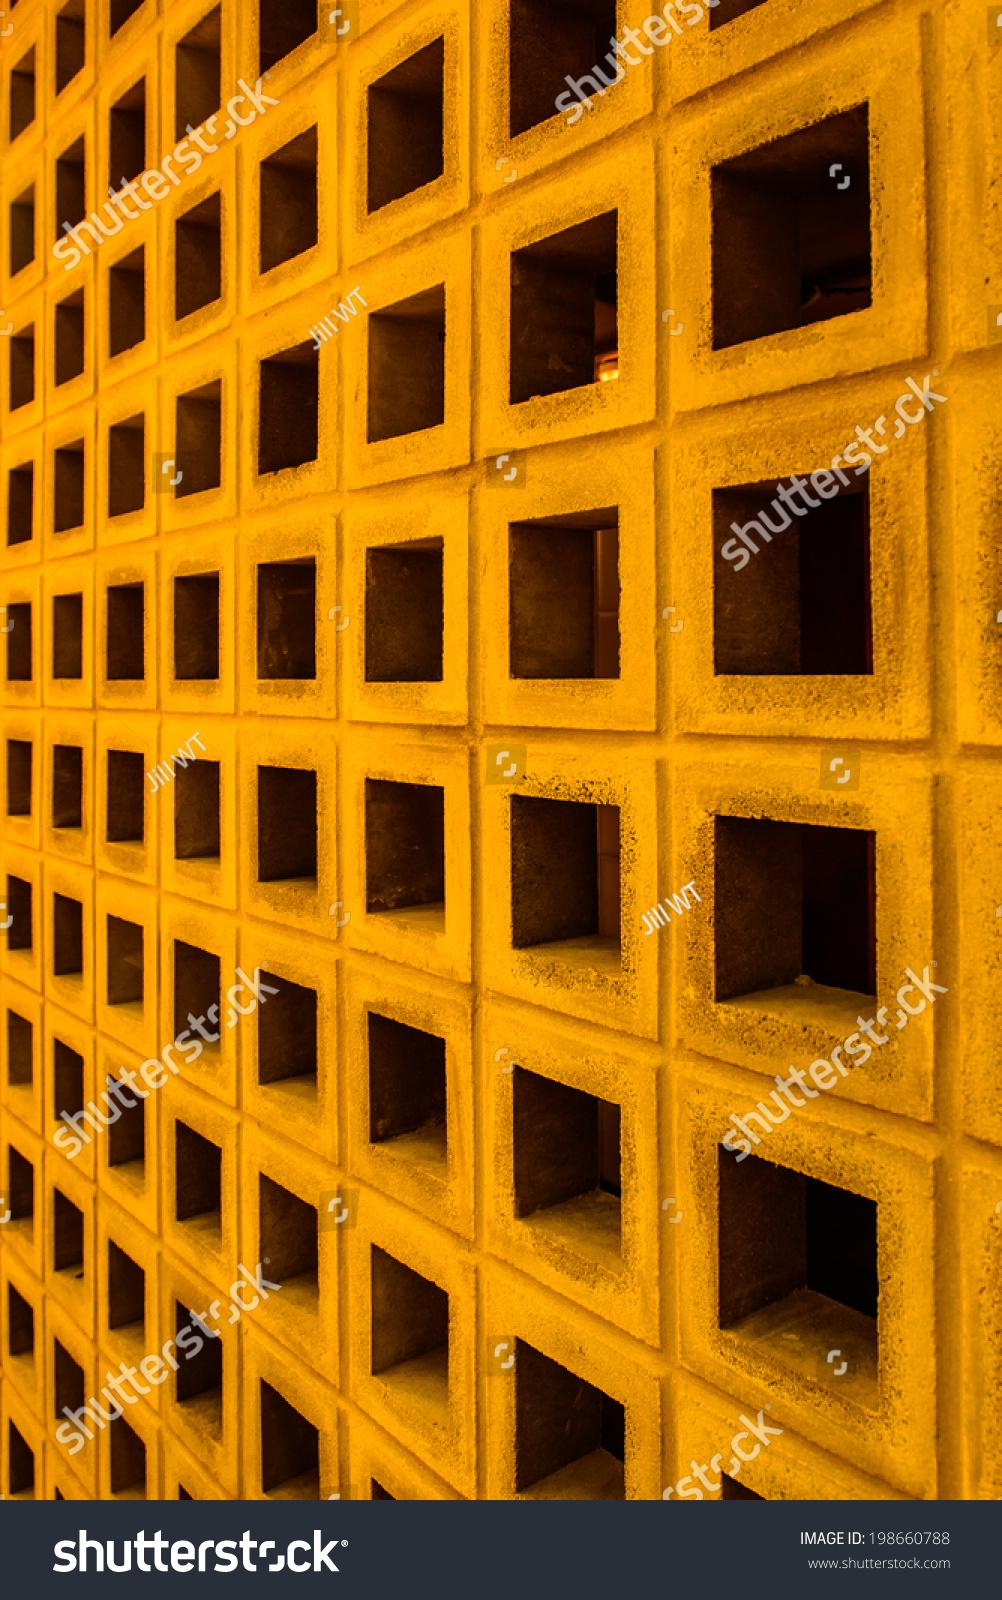 Old Many Orange Color Concrete Cubes Stock Photo 198660788 ...